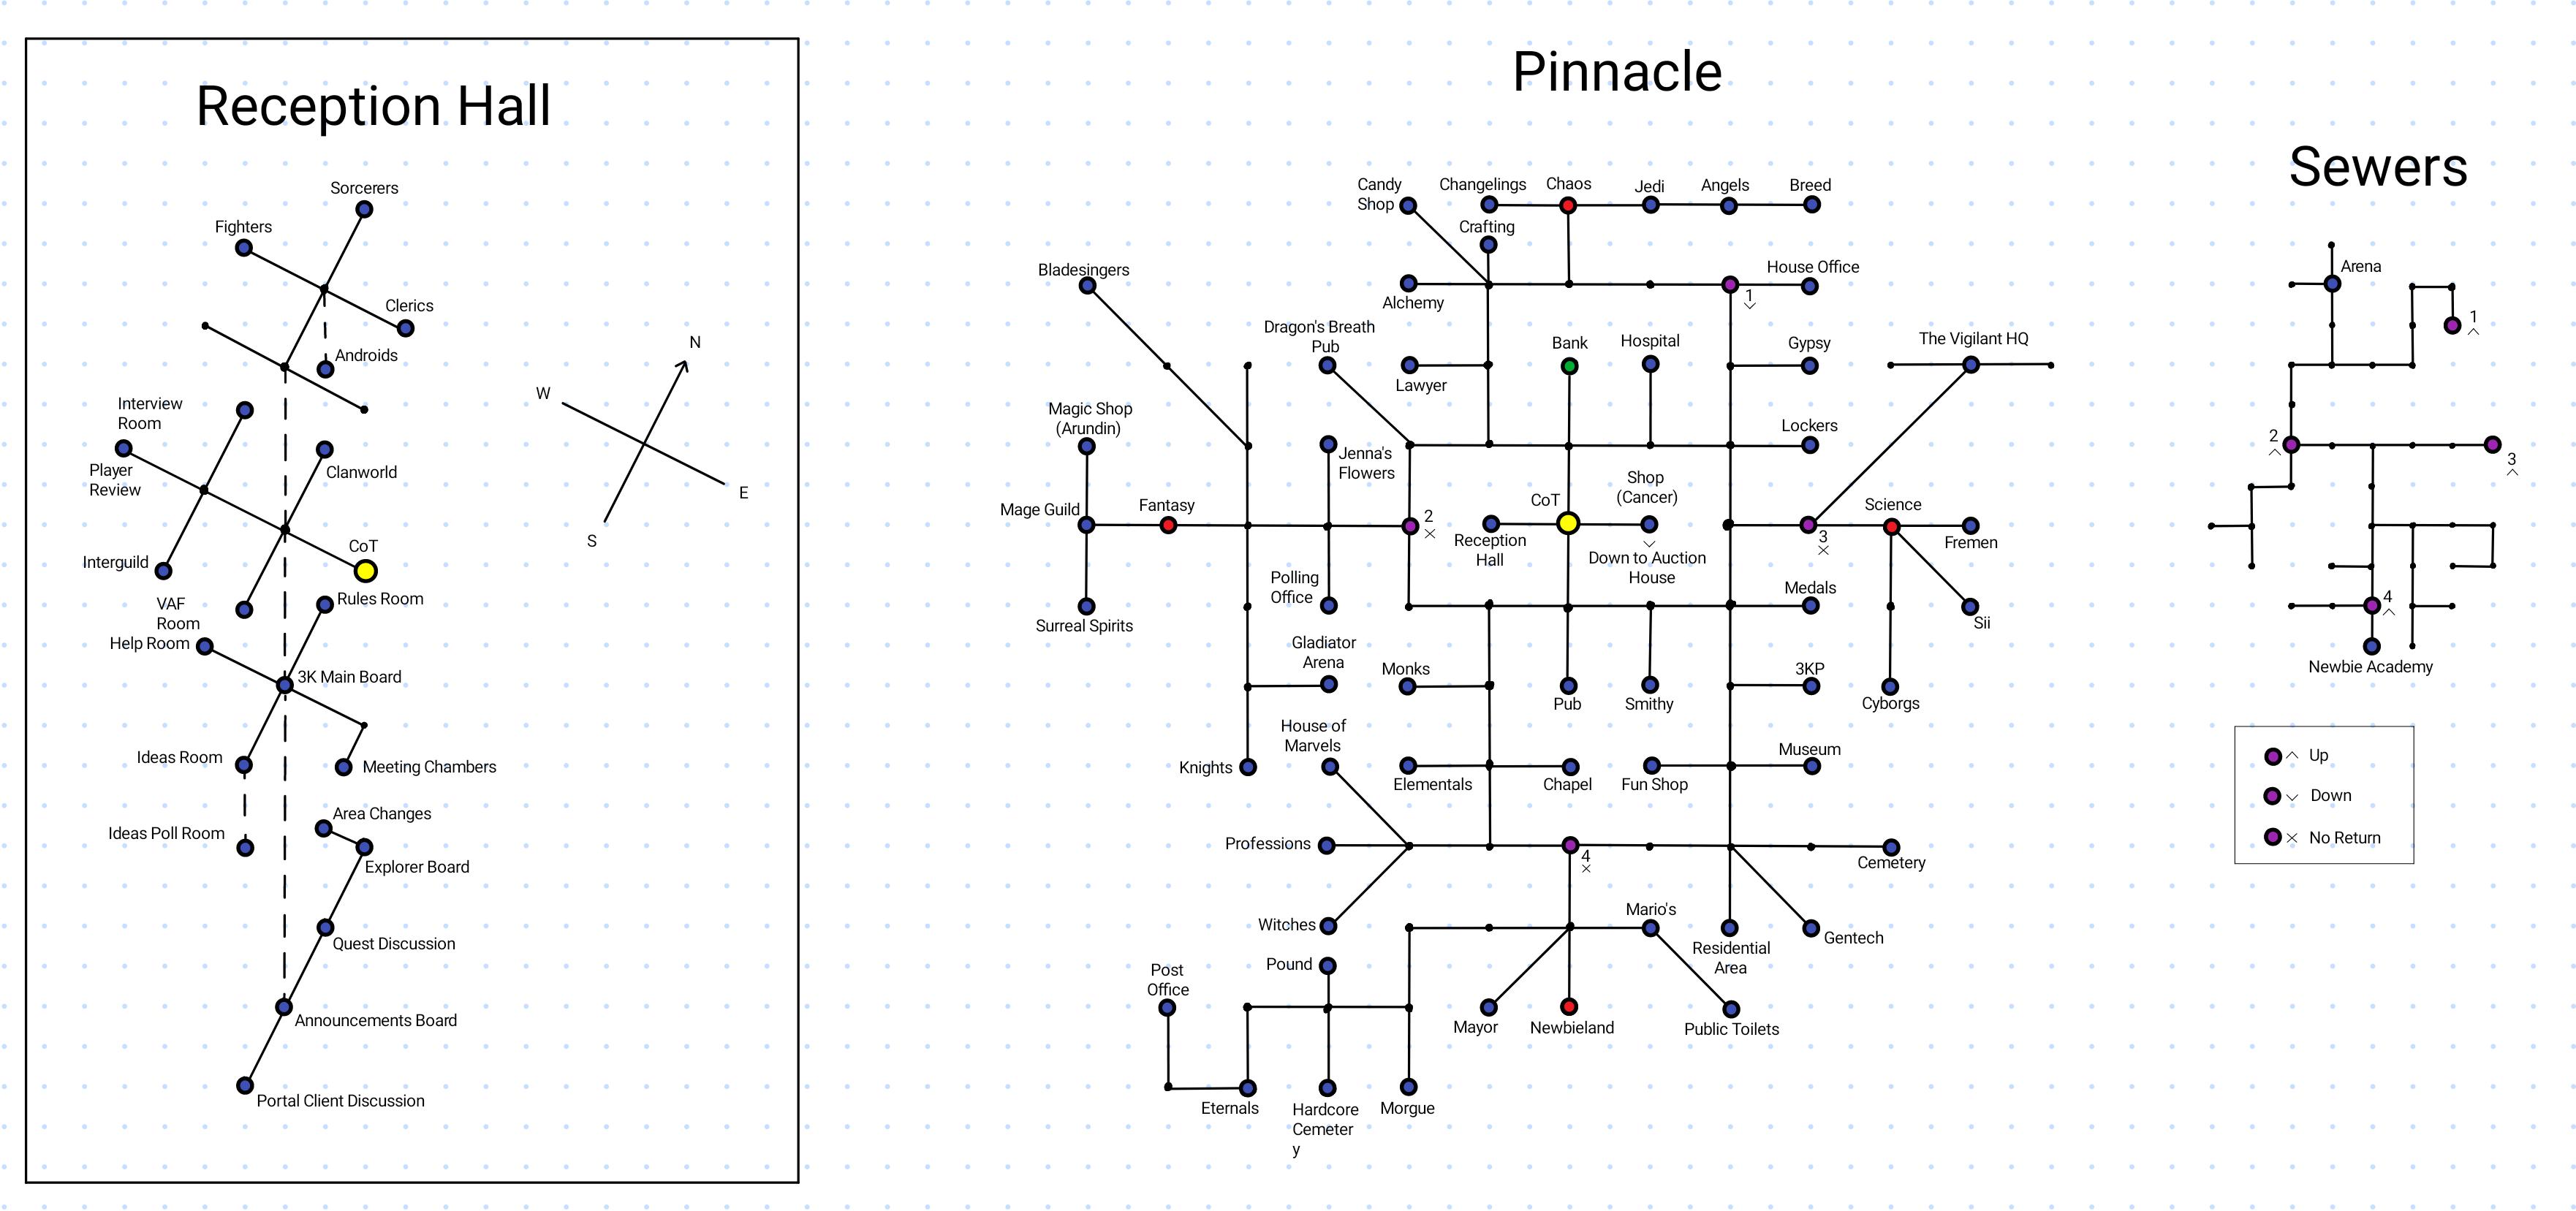 Map of Pinnacle